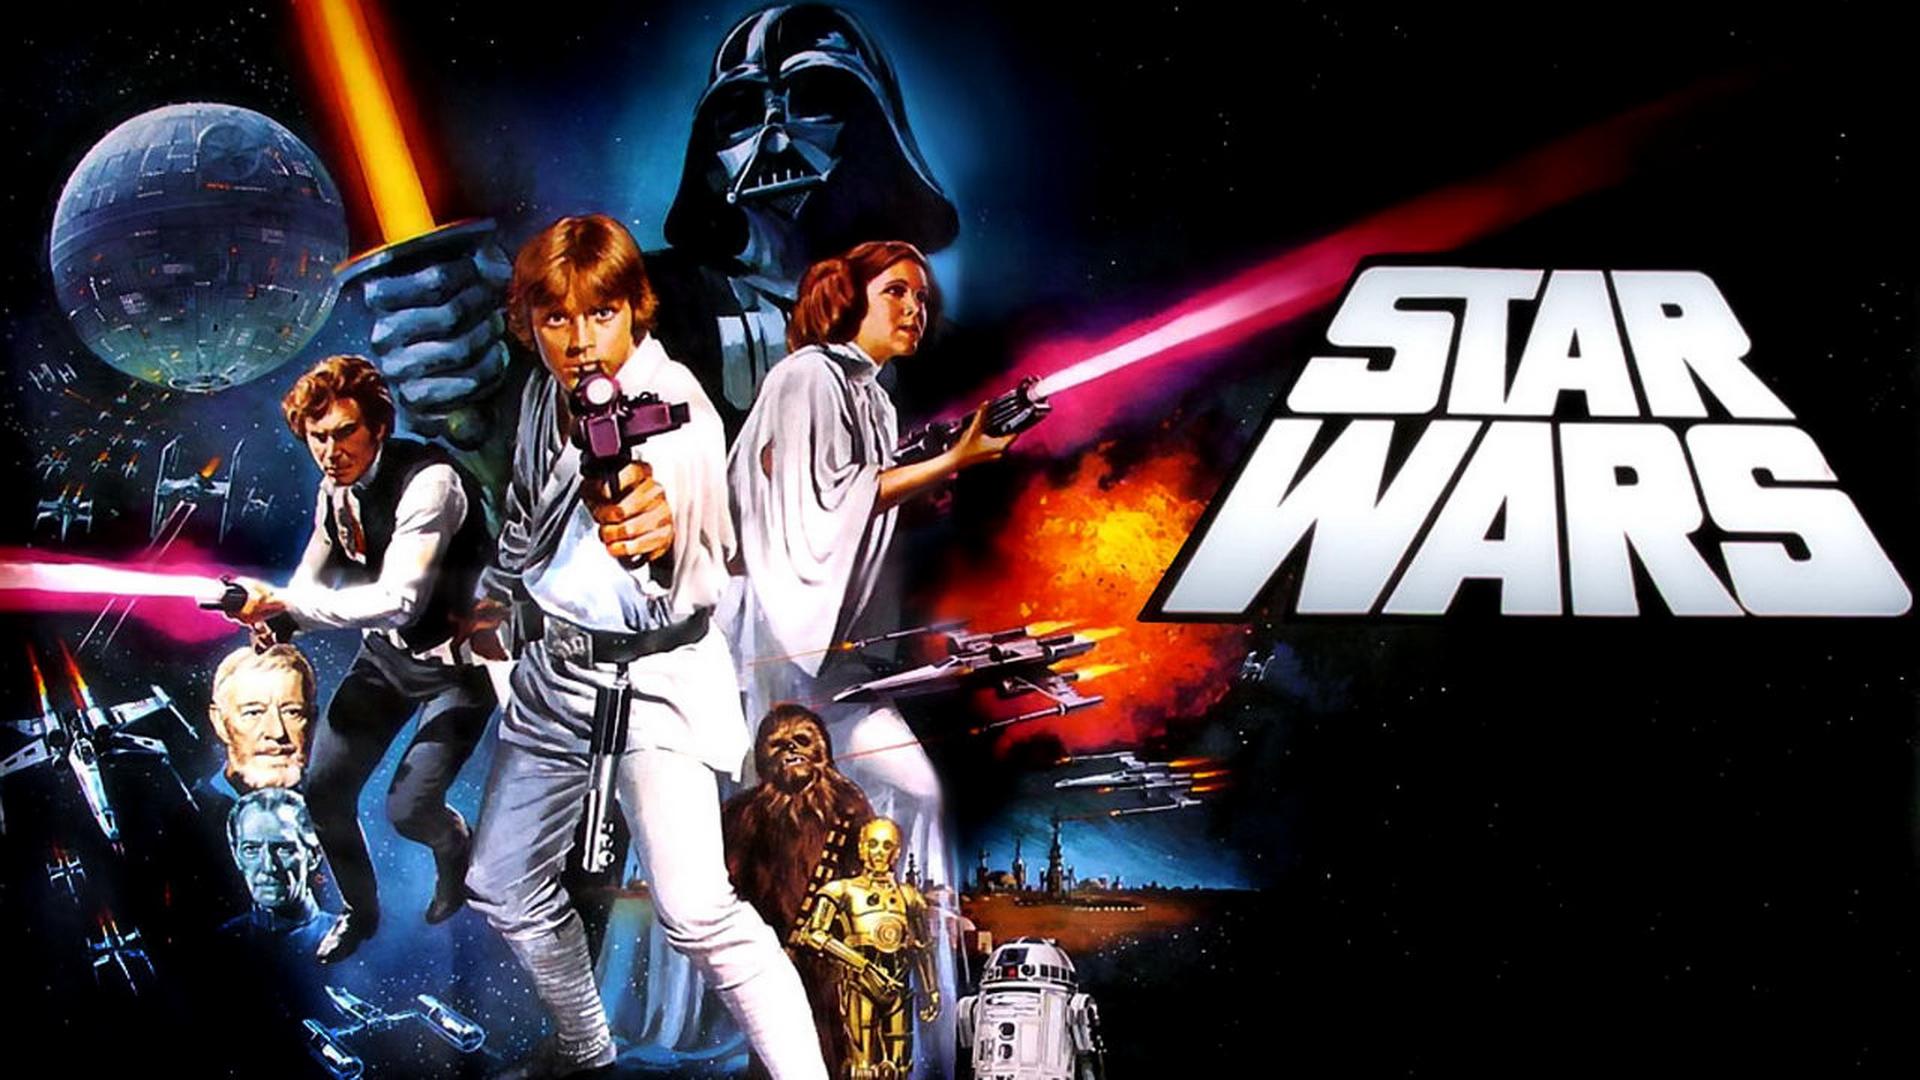 Star Wars Wallpapers Wallpaper 1920x1080